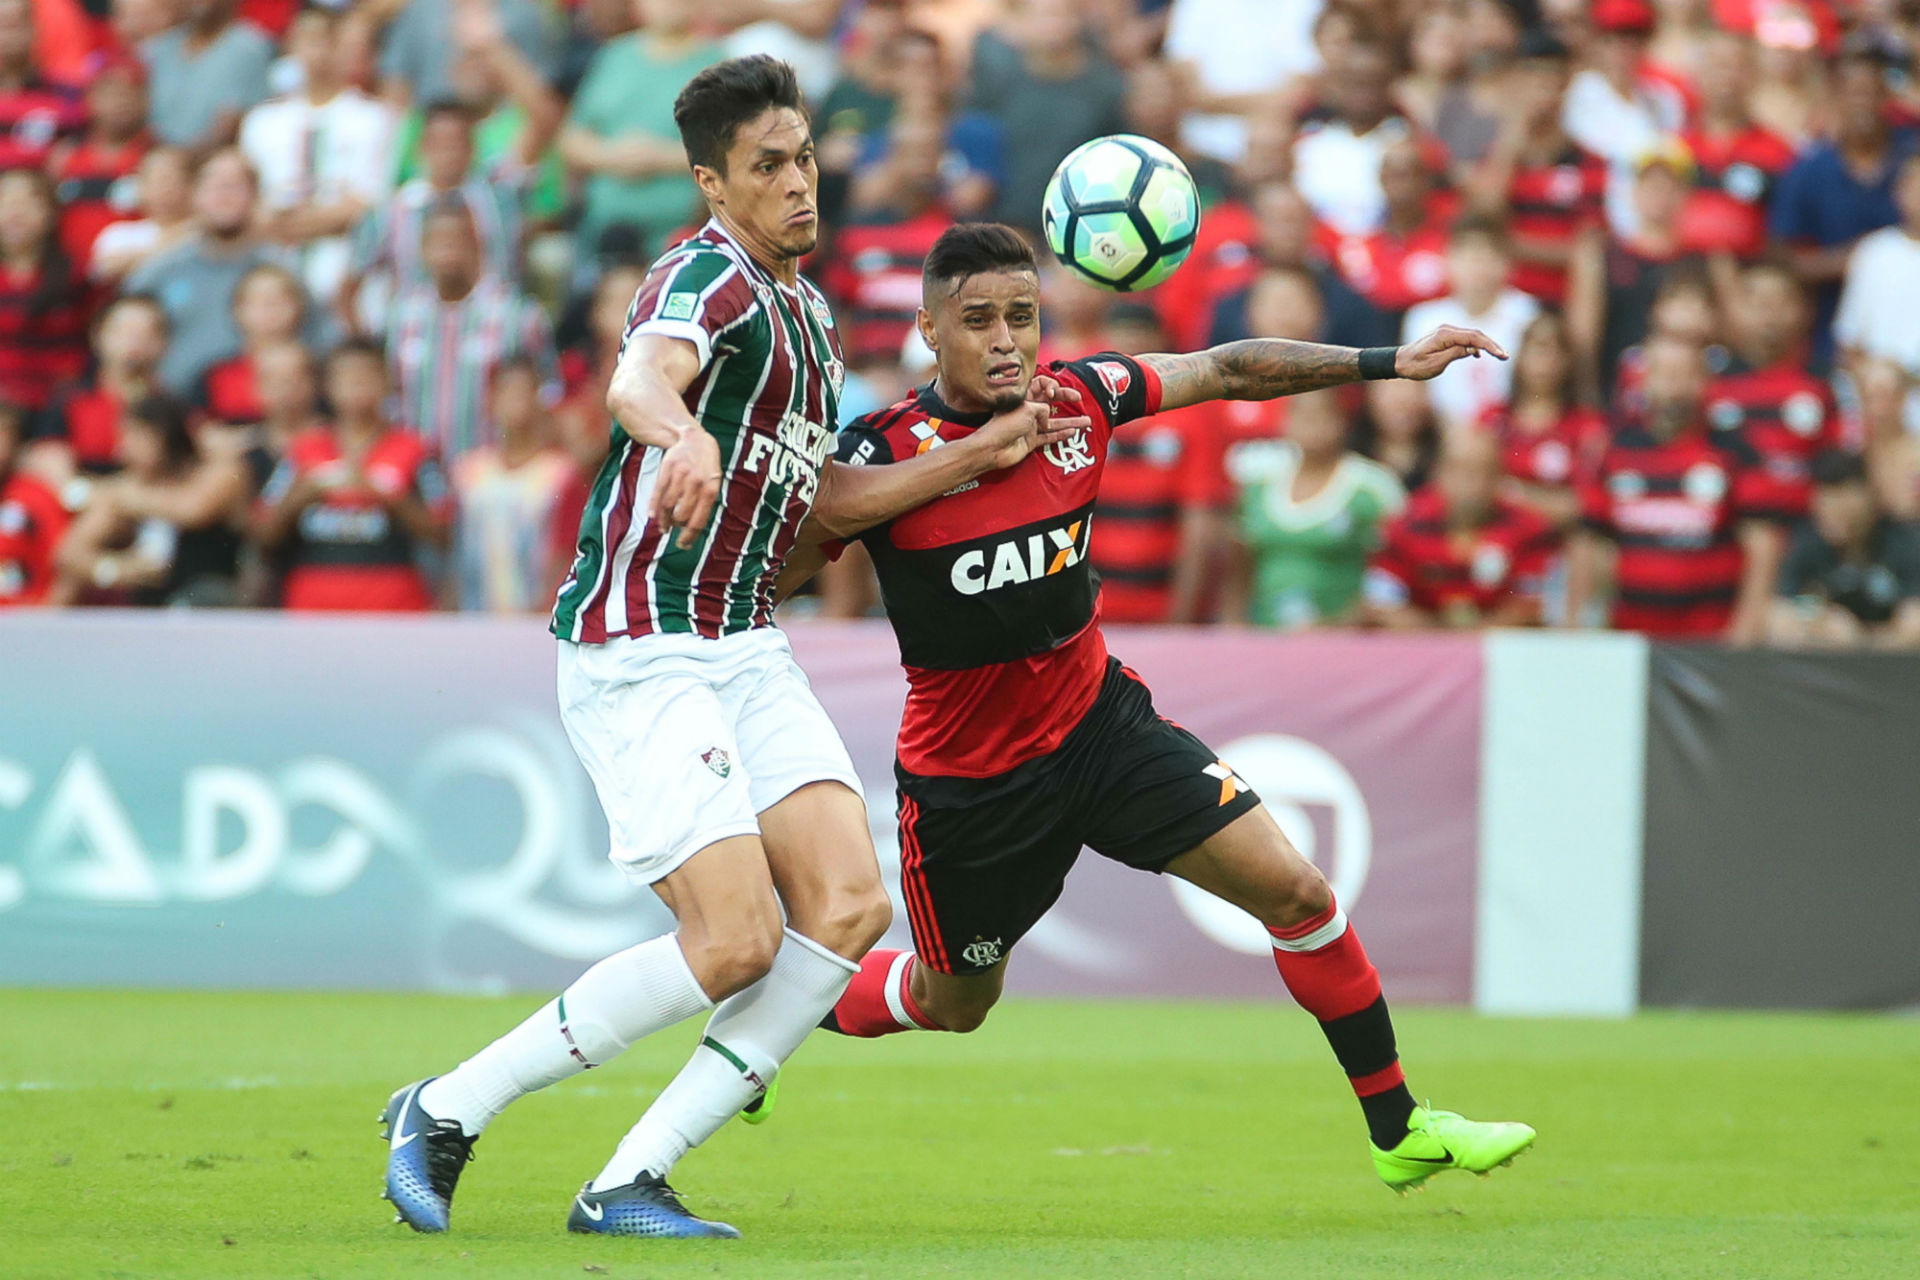 Everton Fluminense x Flamengo 18062017